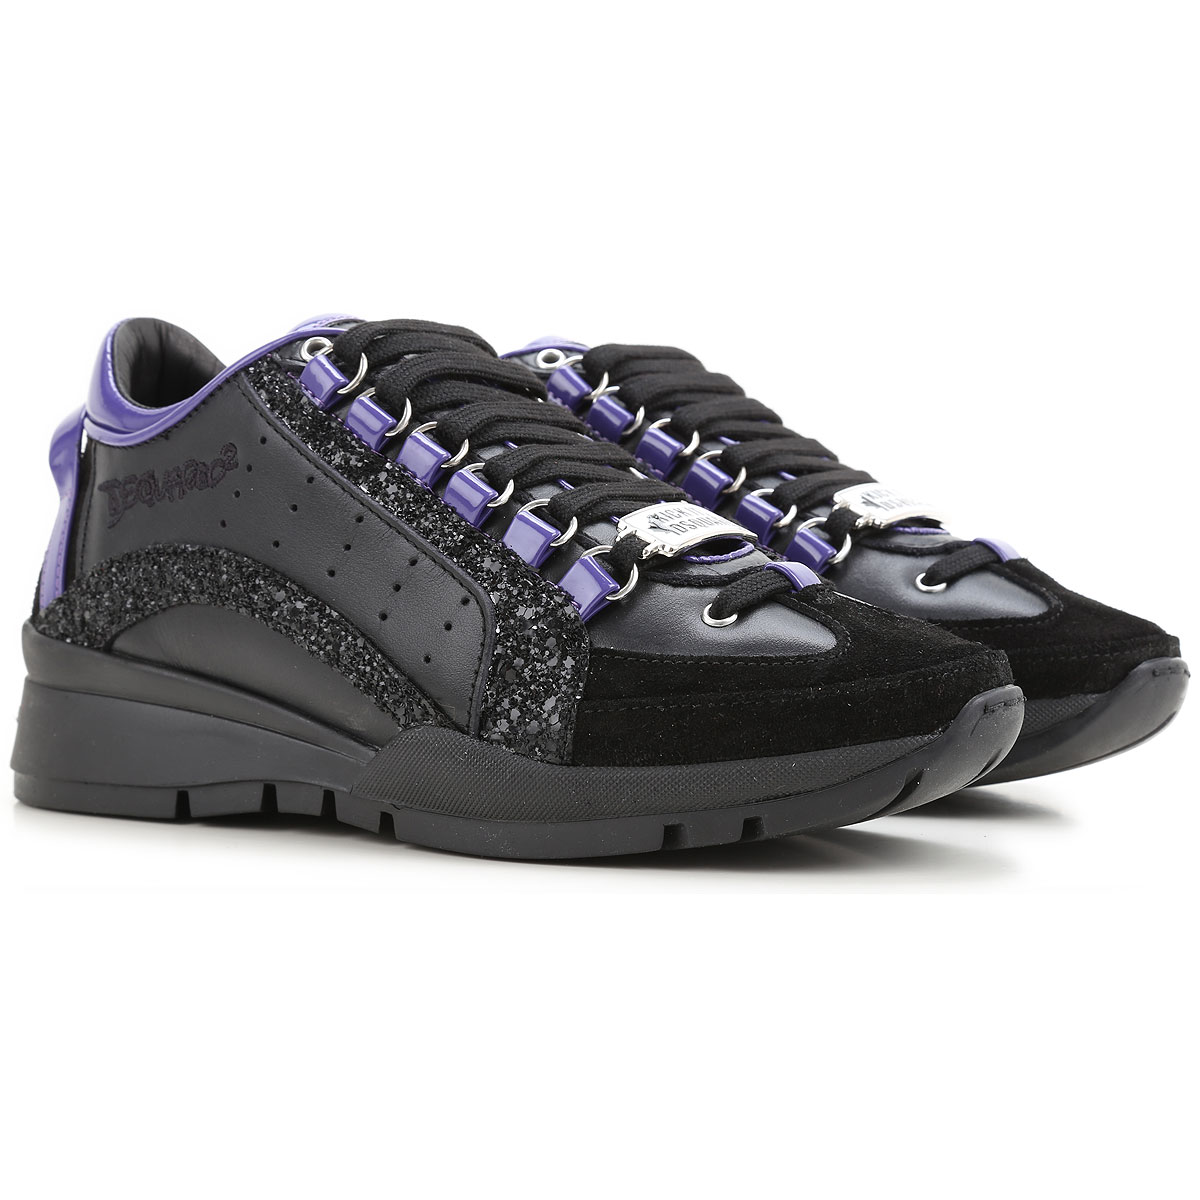 chaussures femme dsquared code produit k501 844 2124. Black Bedroom Furniture Sets. Home Design Ideas